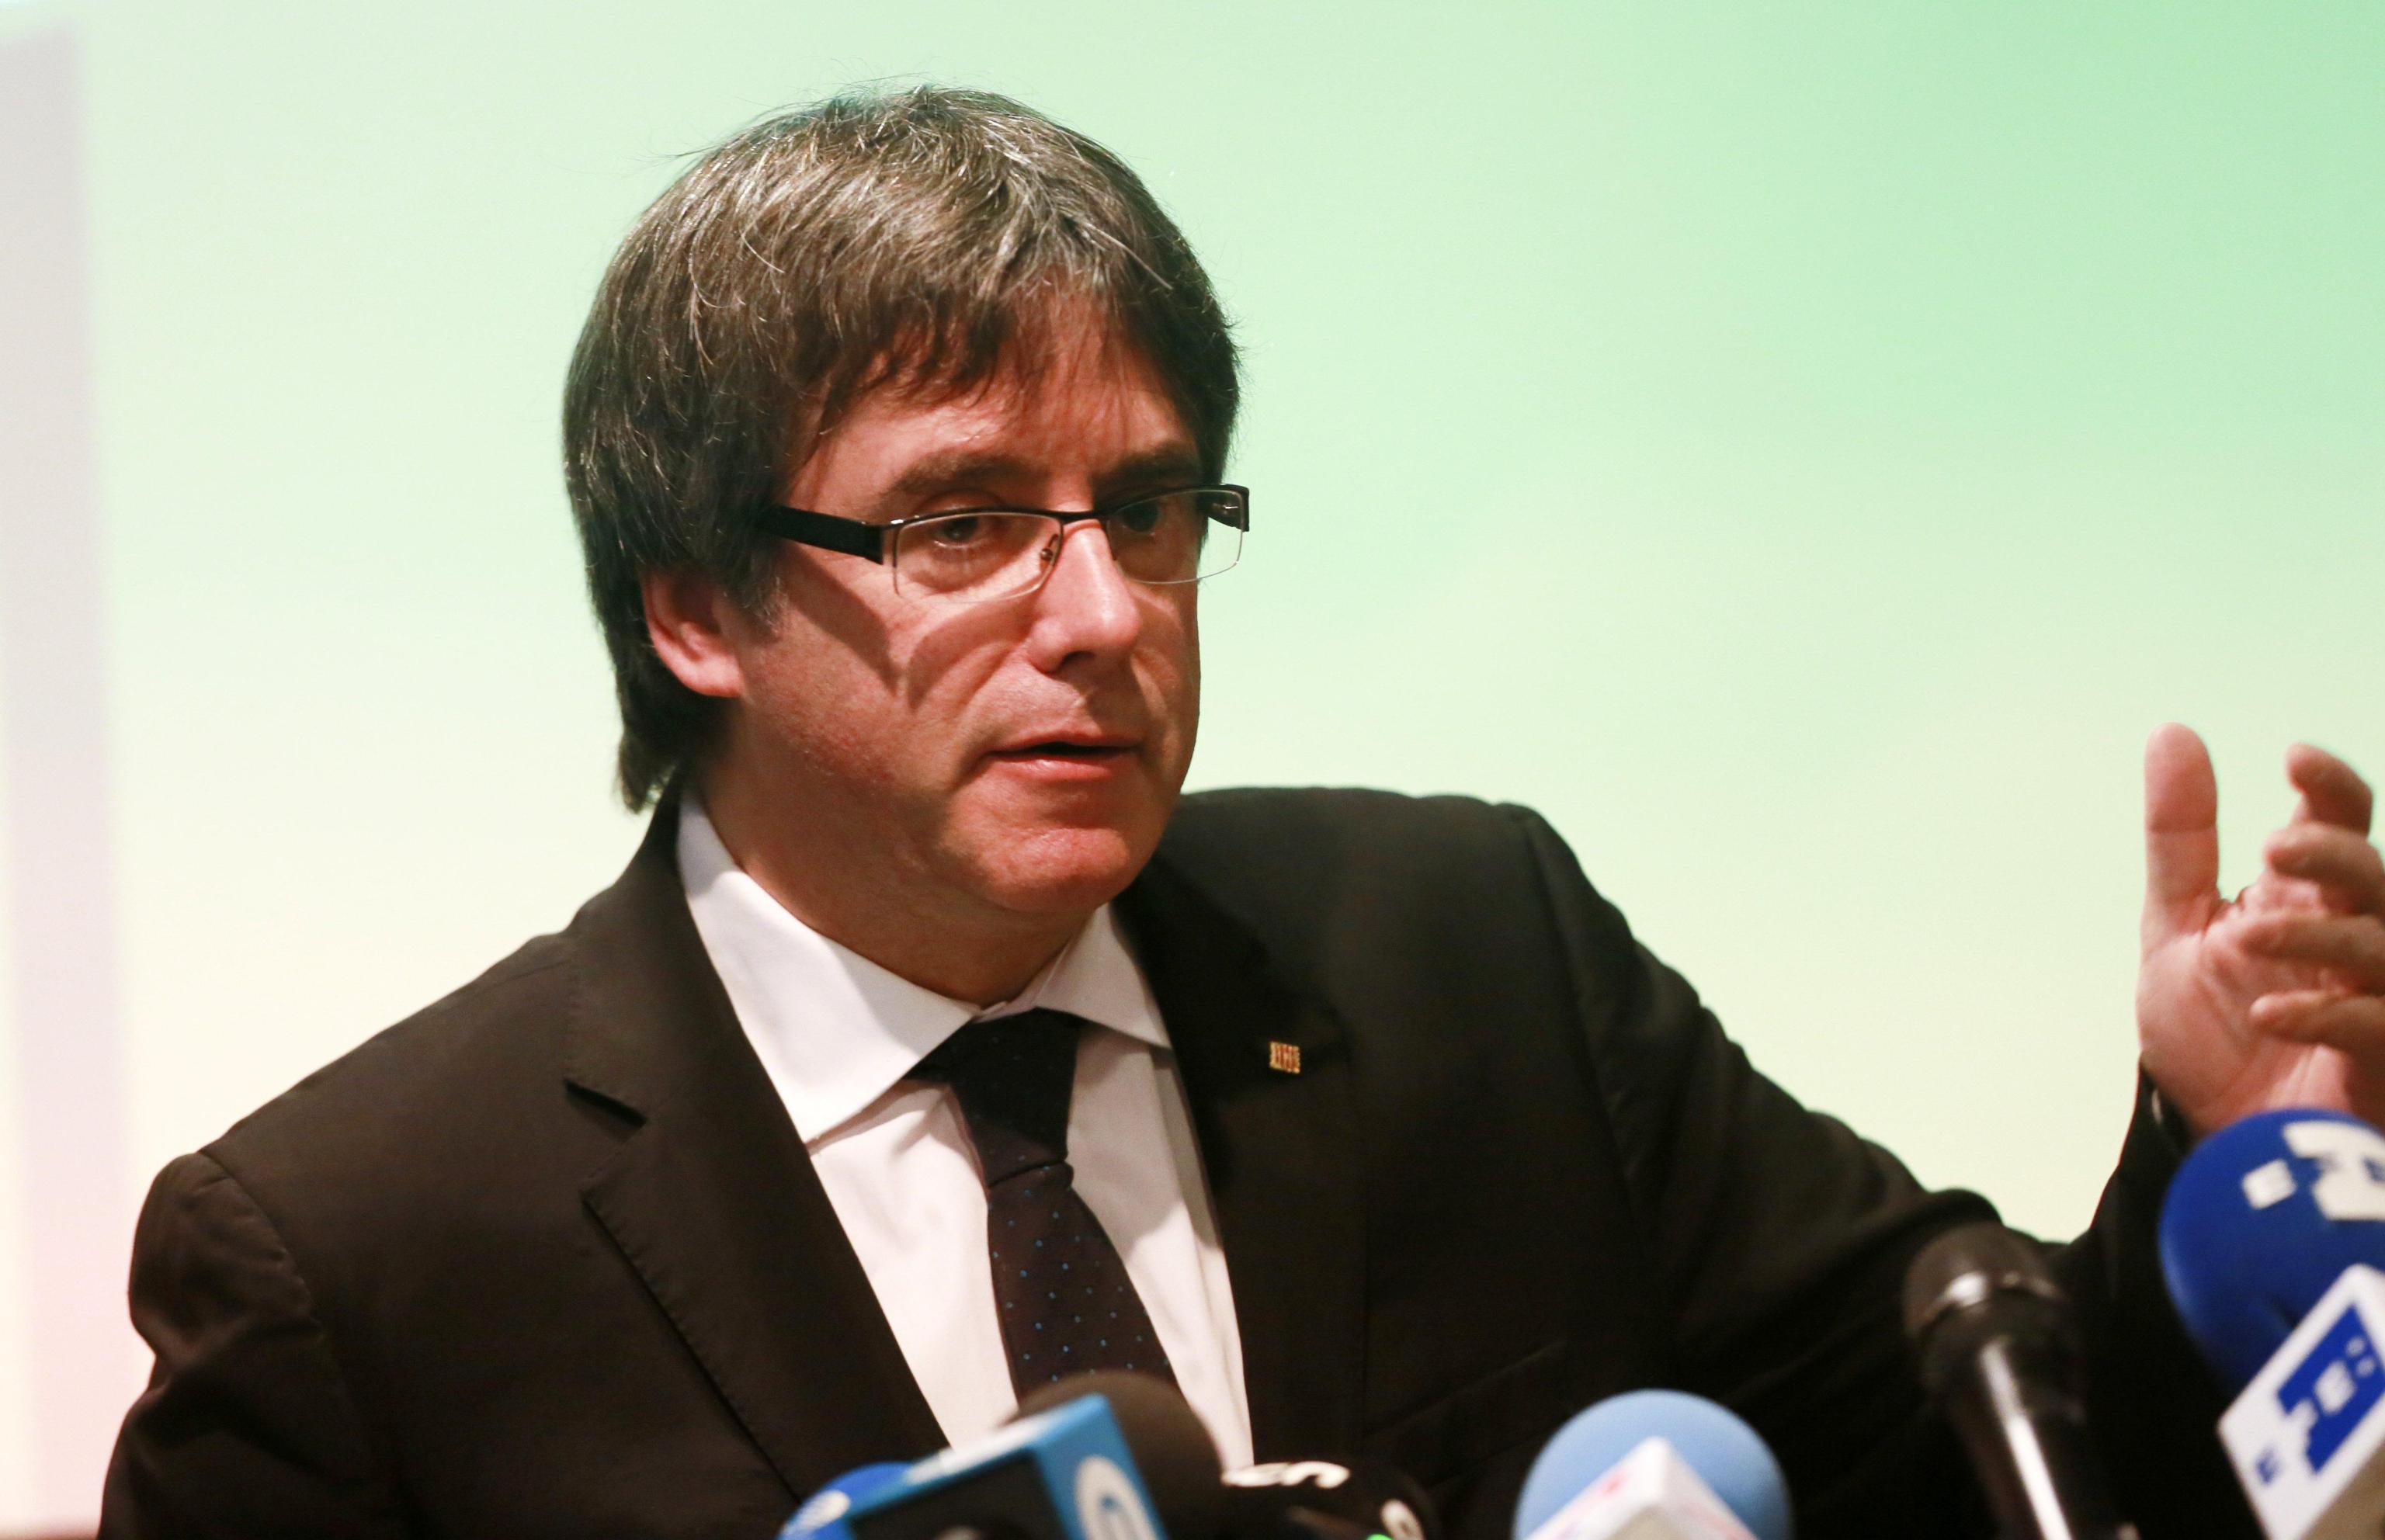 Puigdemont forse in Belgio fino gennaio